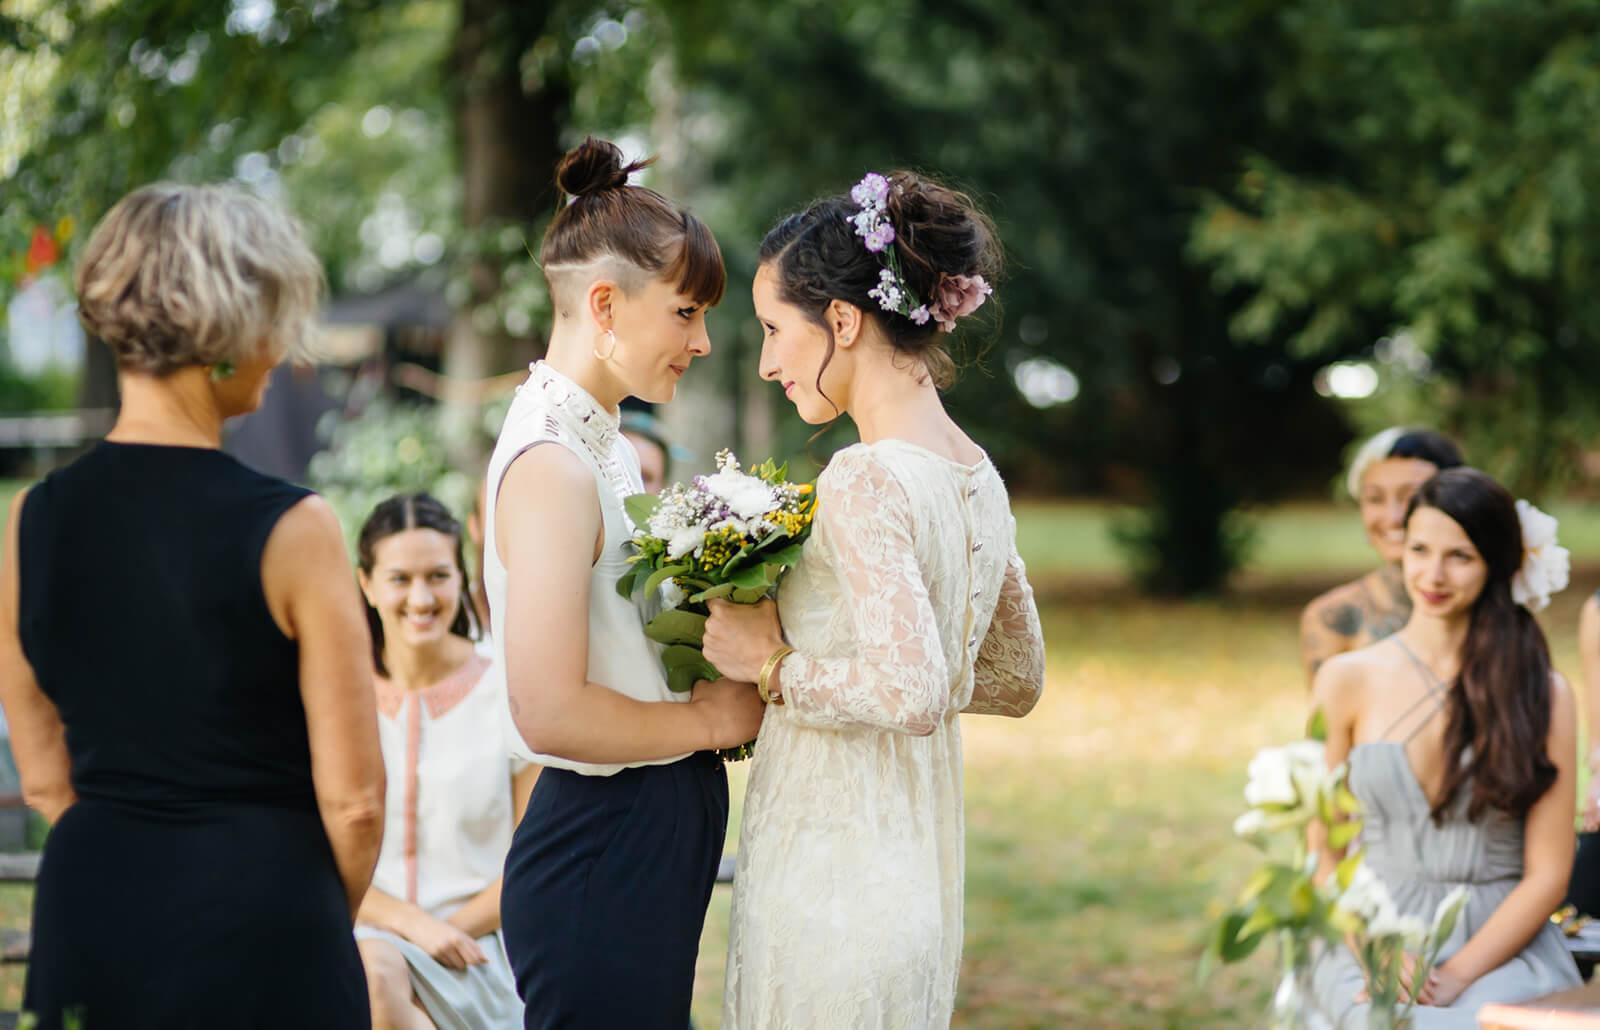 dos-mujeres-casandose.jpg